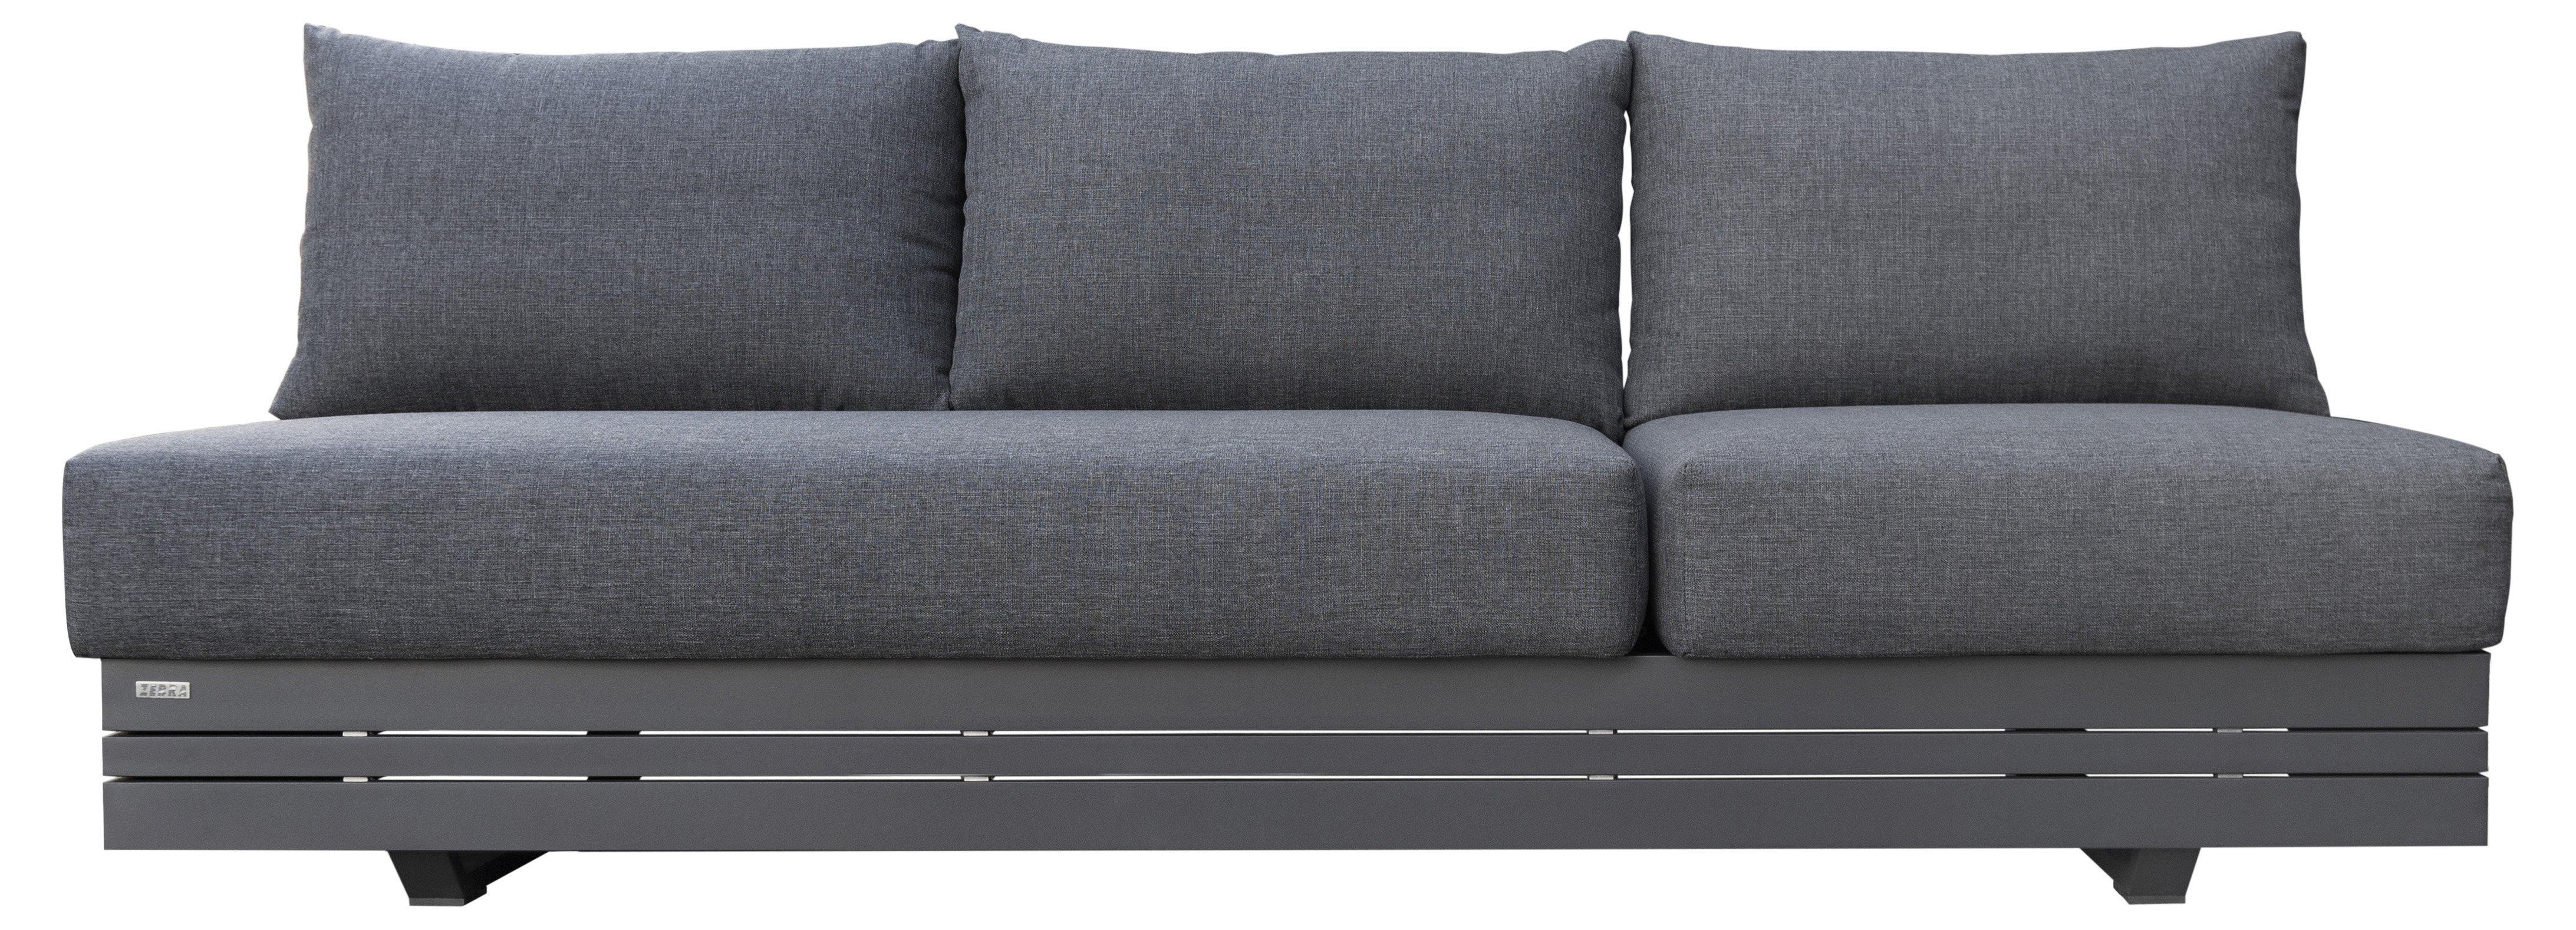 Sofa Alu-Gestell